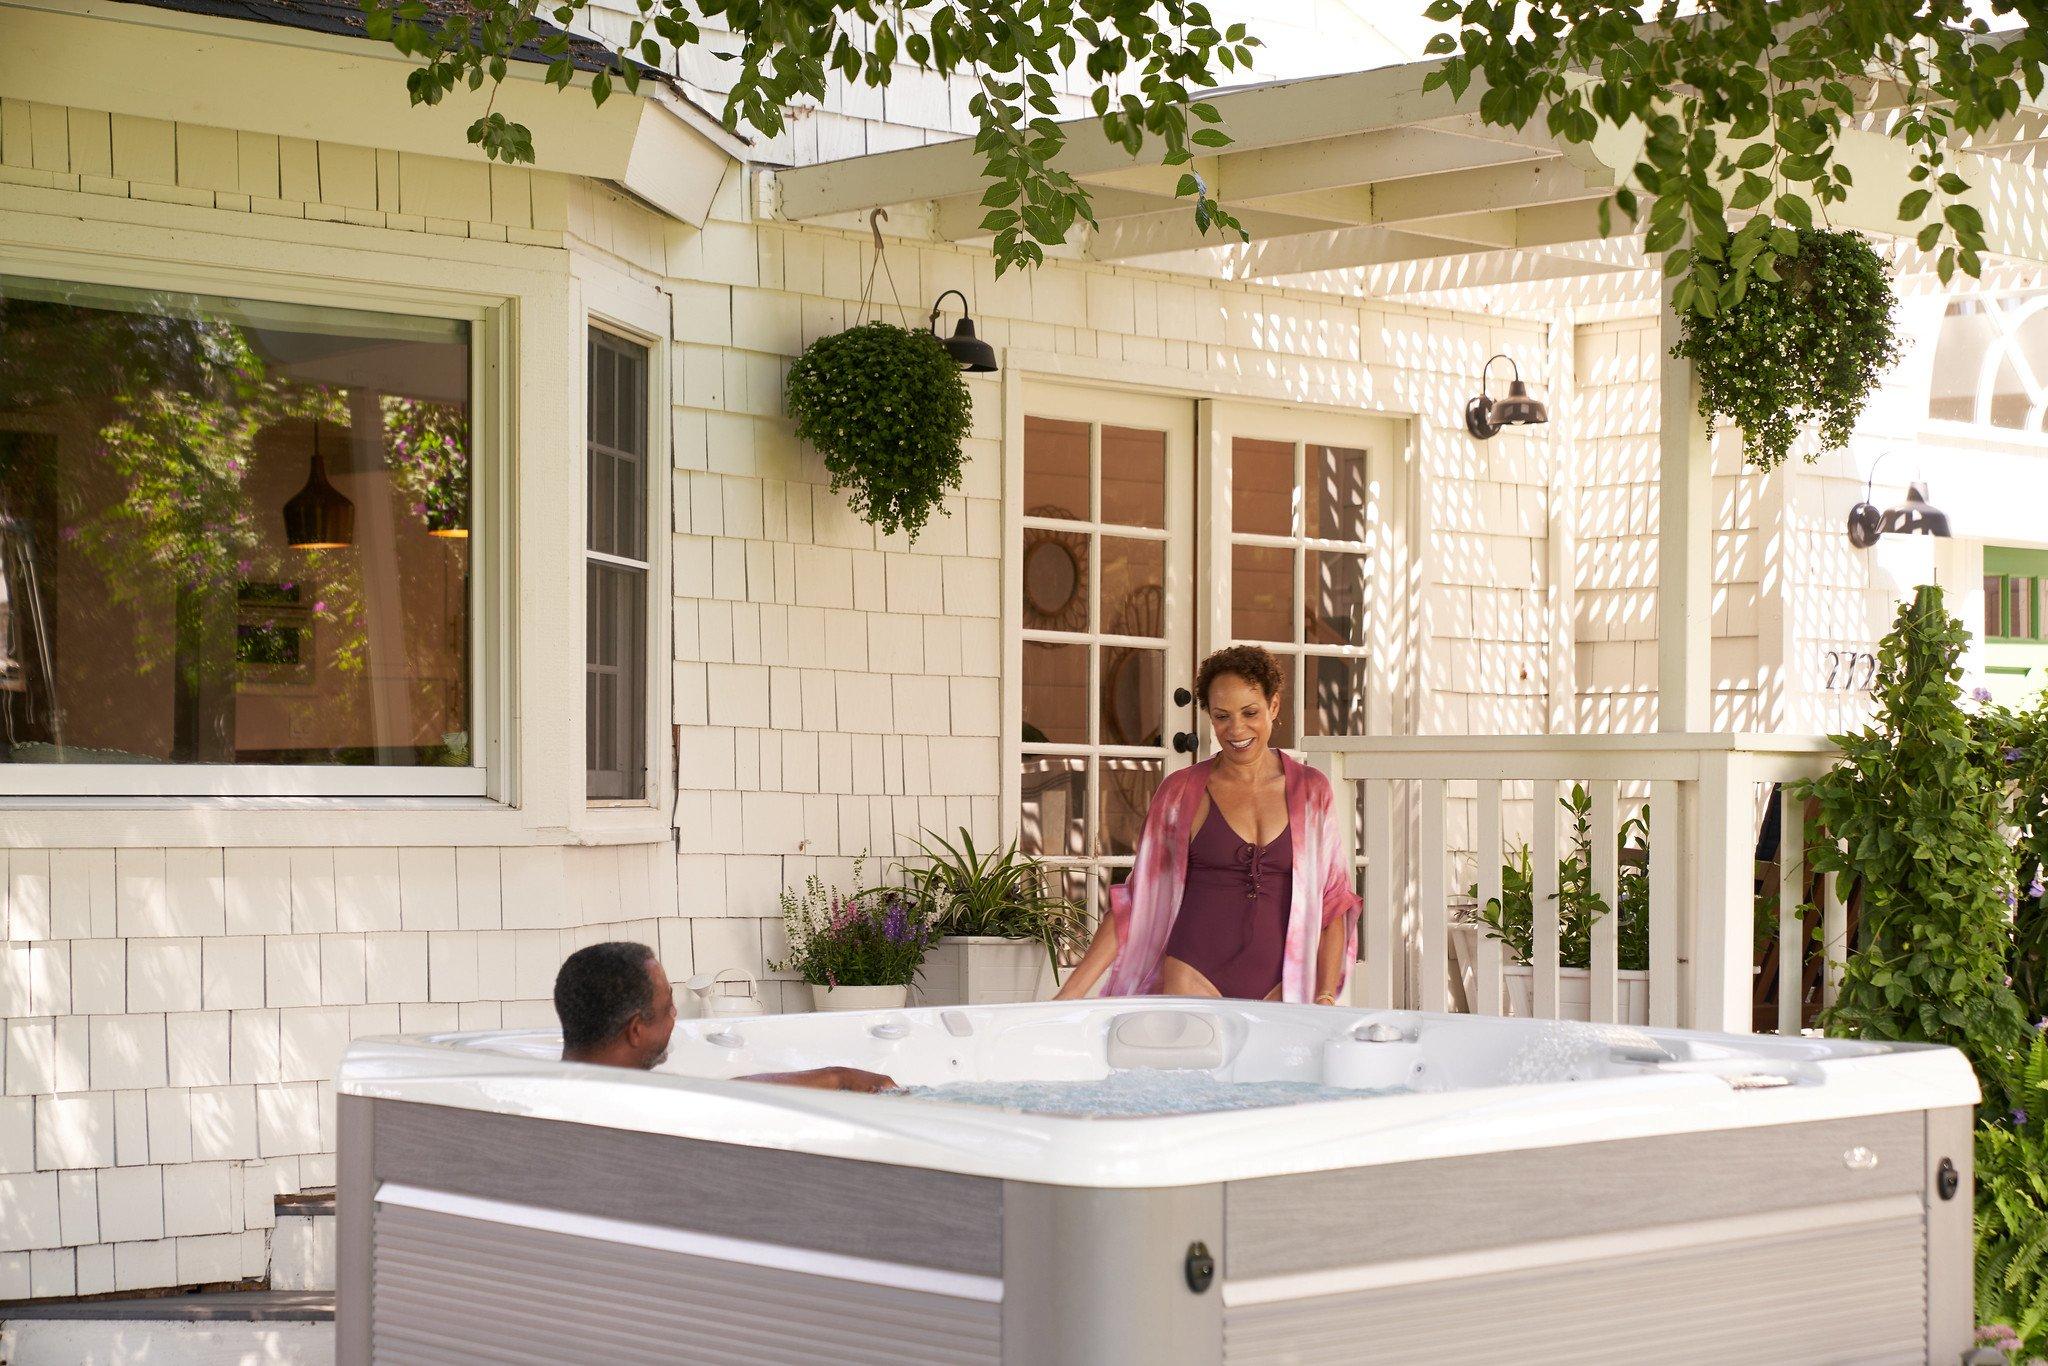 Bringing your hot tub vision to life!